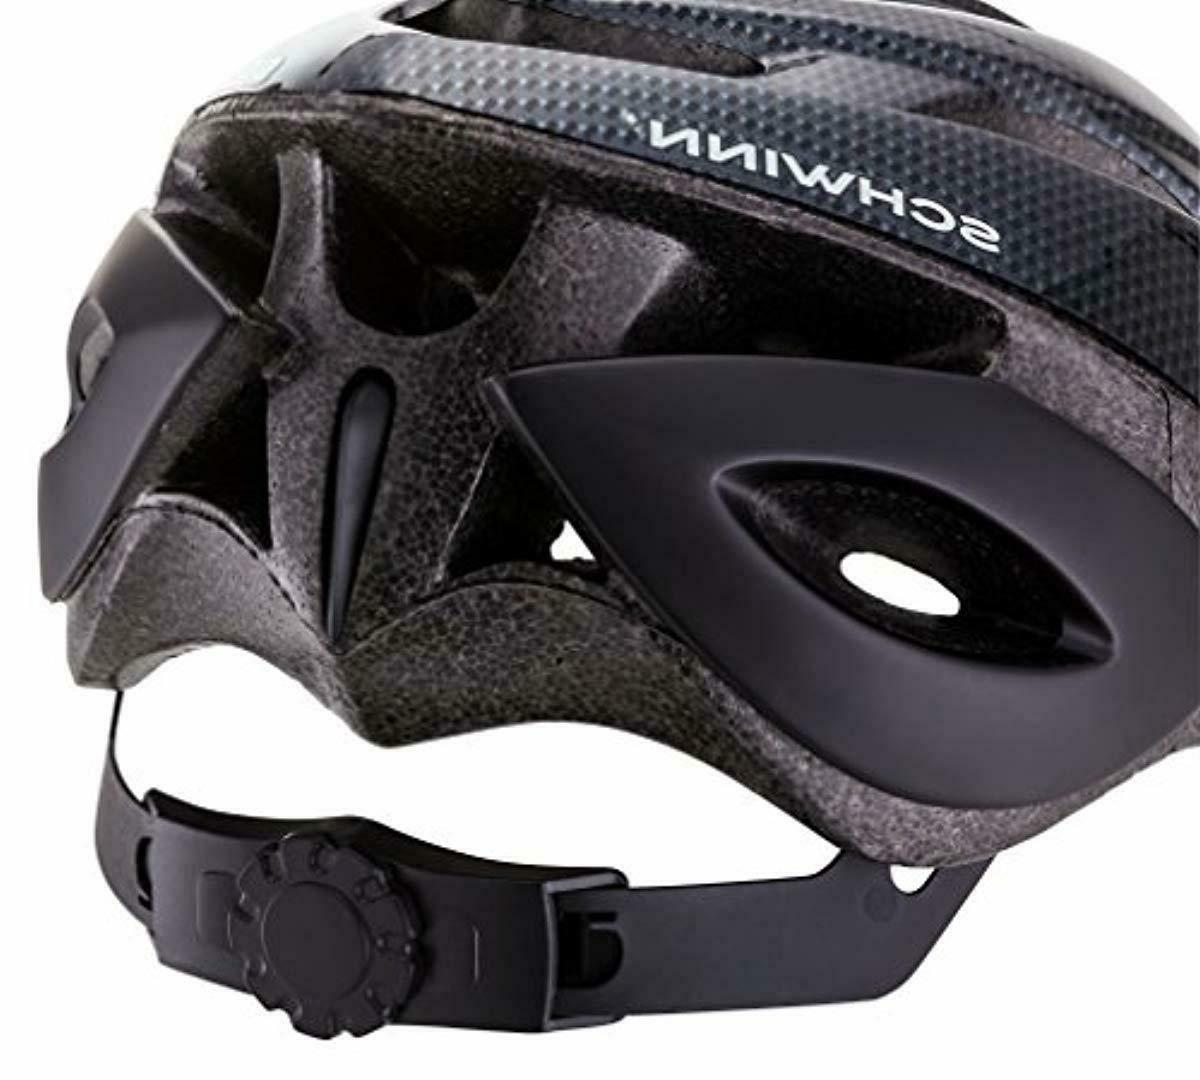 Schwinn Lightweight Bicycle Degree Comf